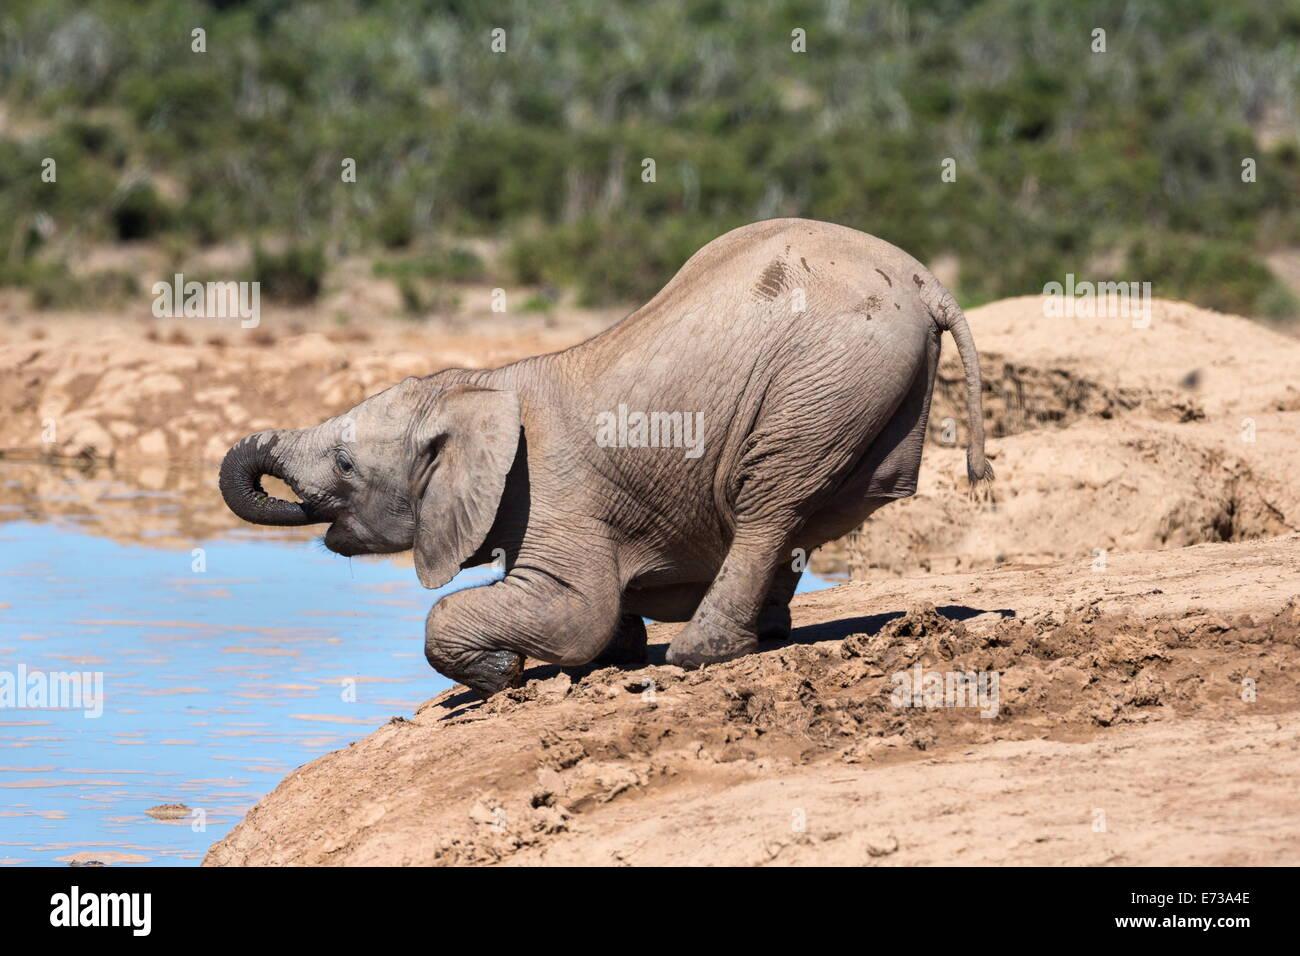 African baby elephant drinking (Loxodonta africana) at Hapoor waterhole, Addo Elephant National Park, Eastern Cape, - Stock Image